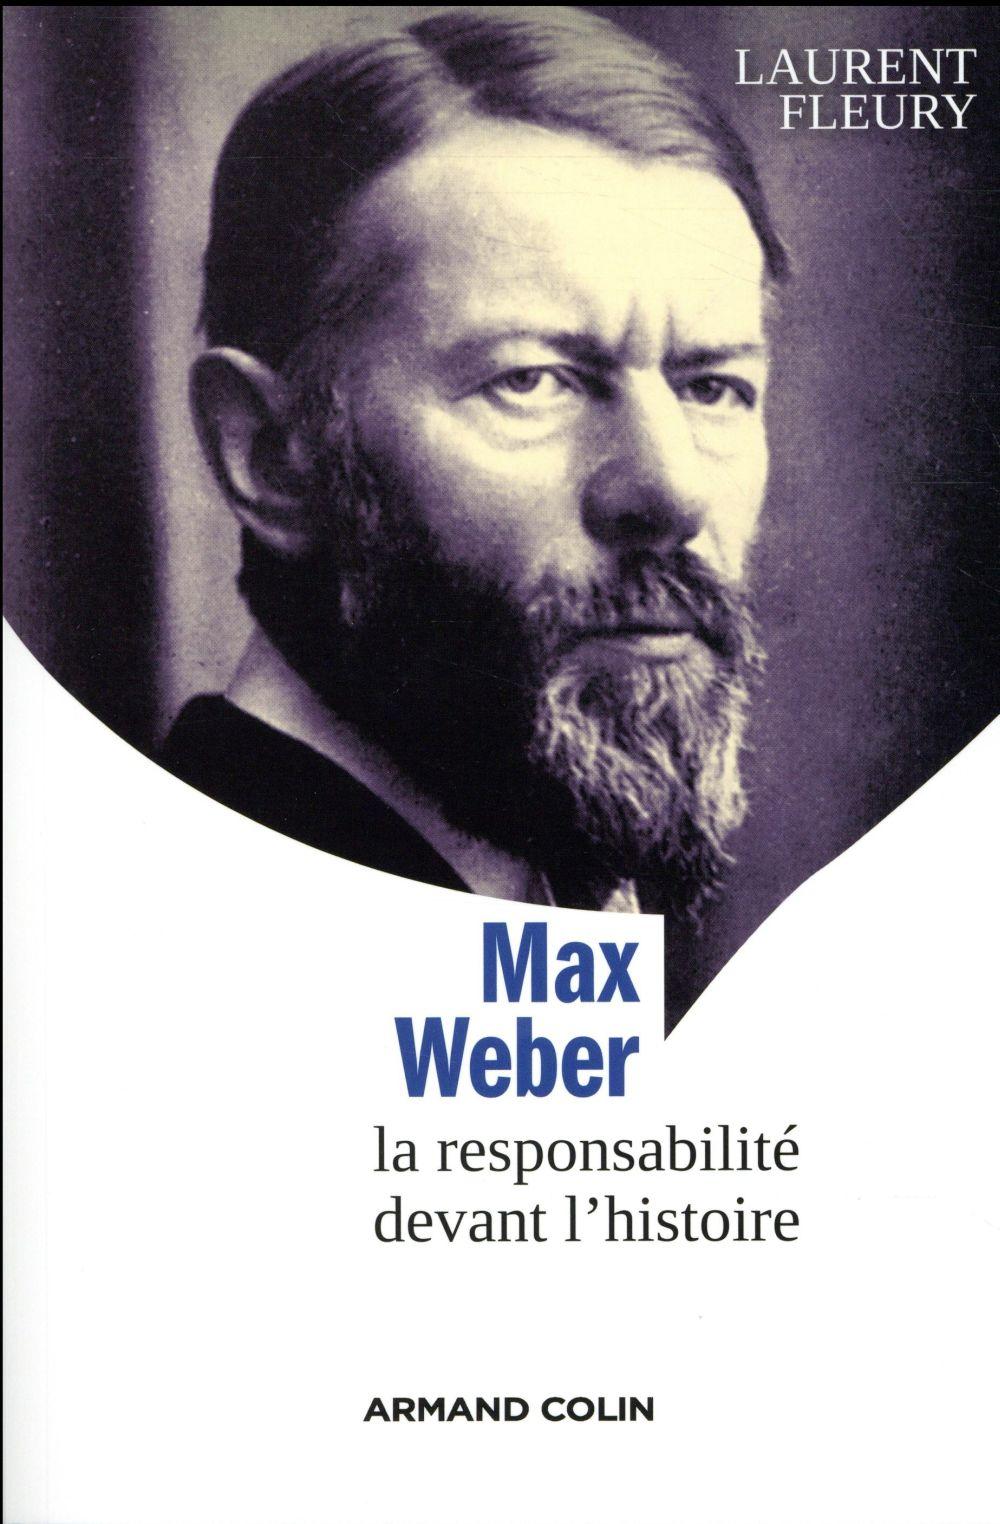 MAX WEBER   LA RESPONSABILITE DEVANT L'HISTOIRE